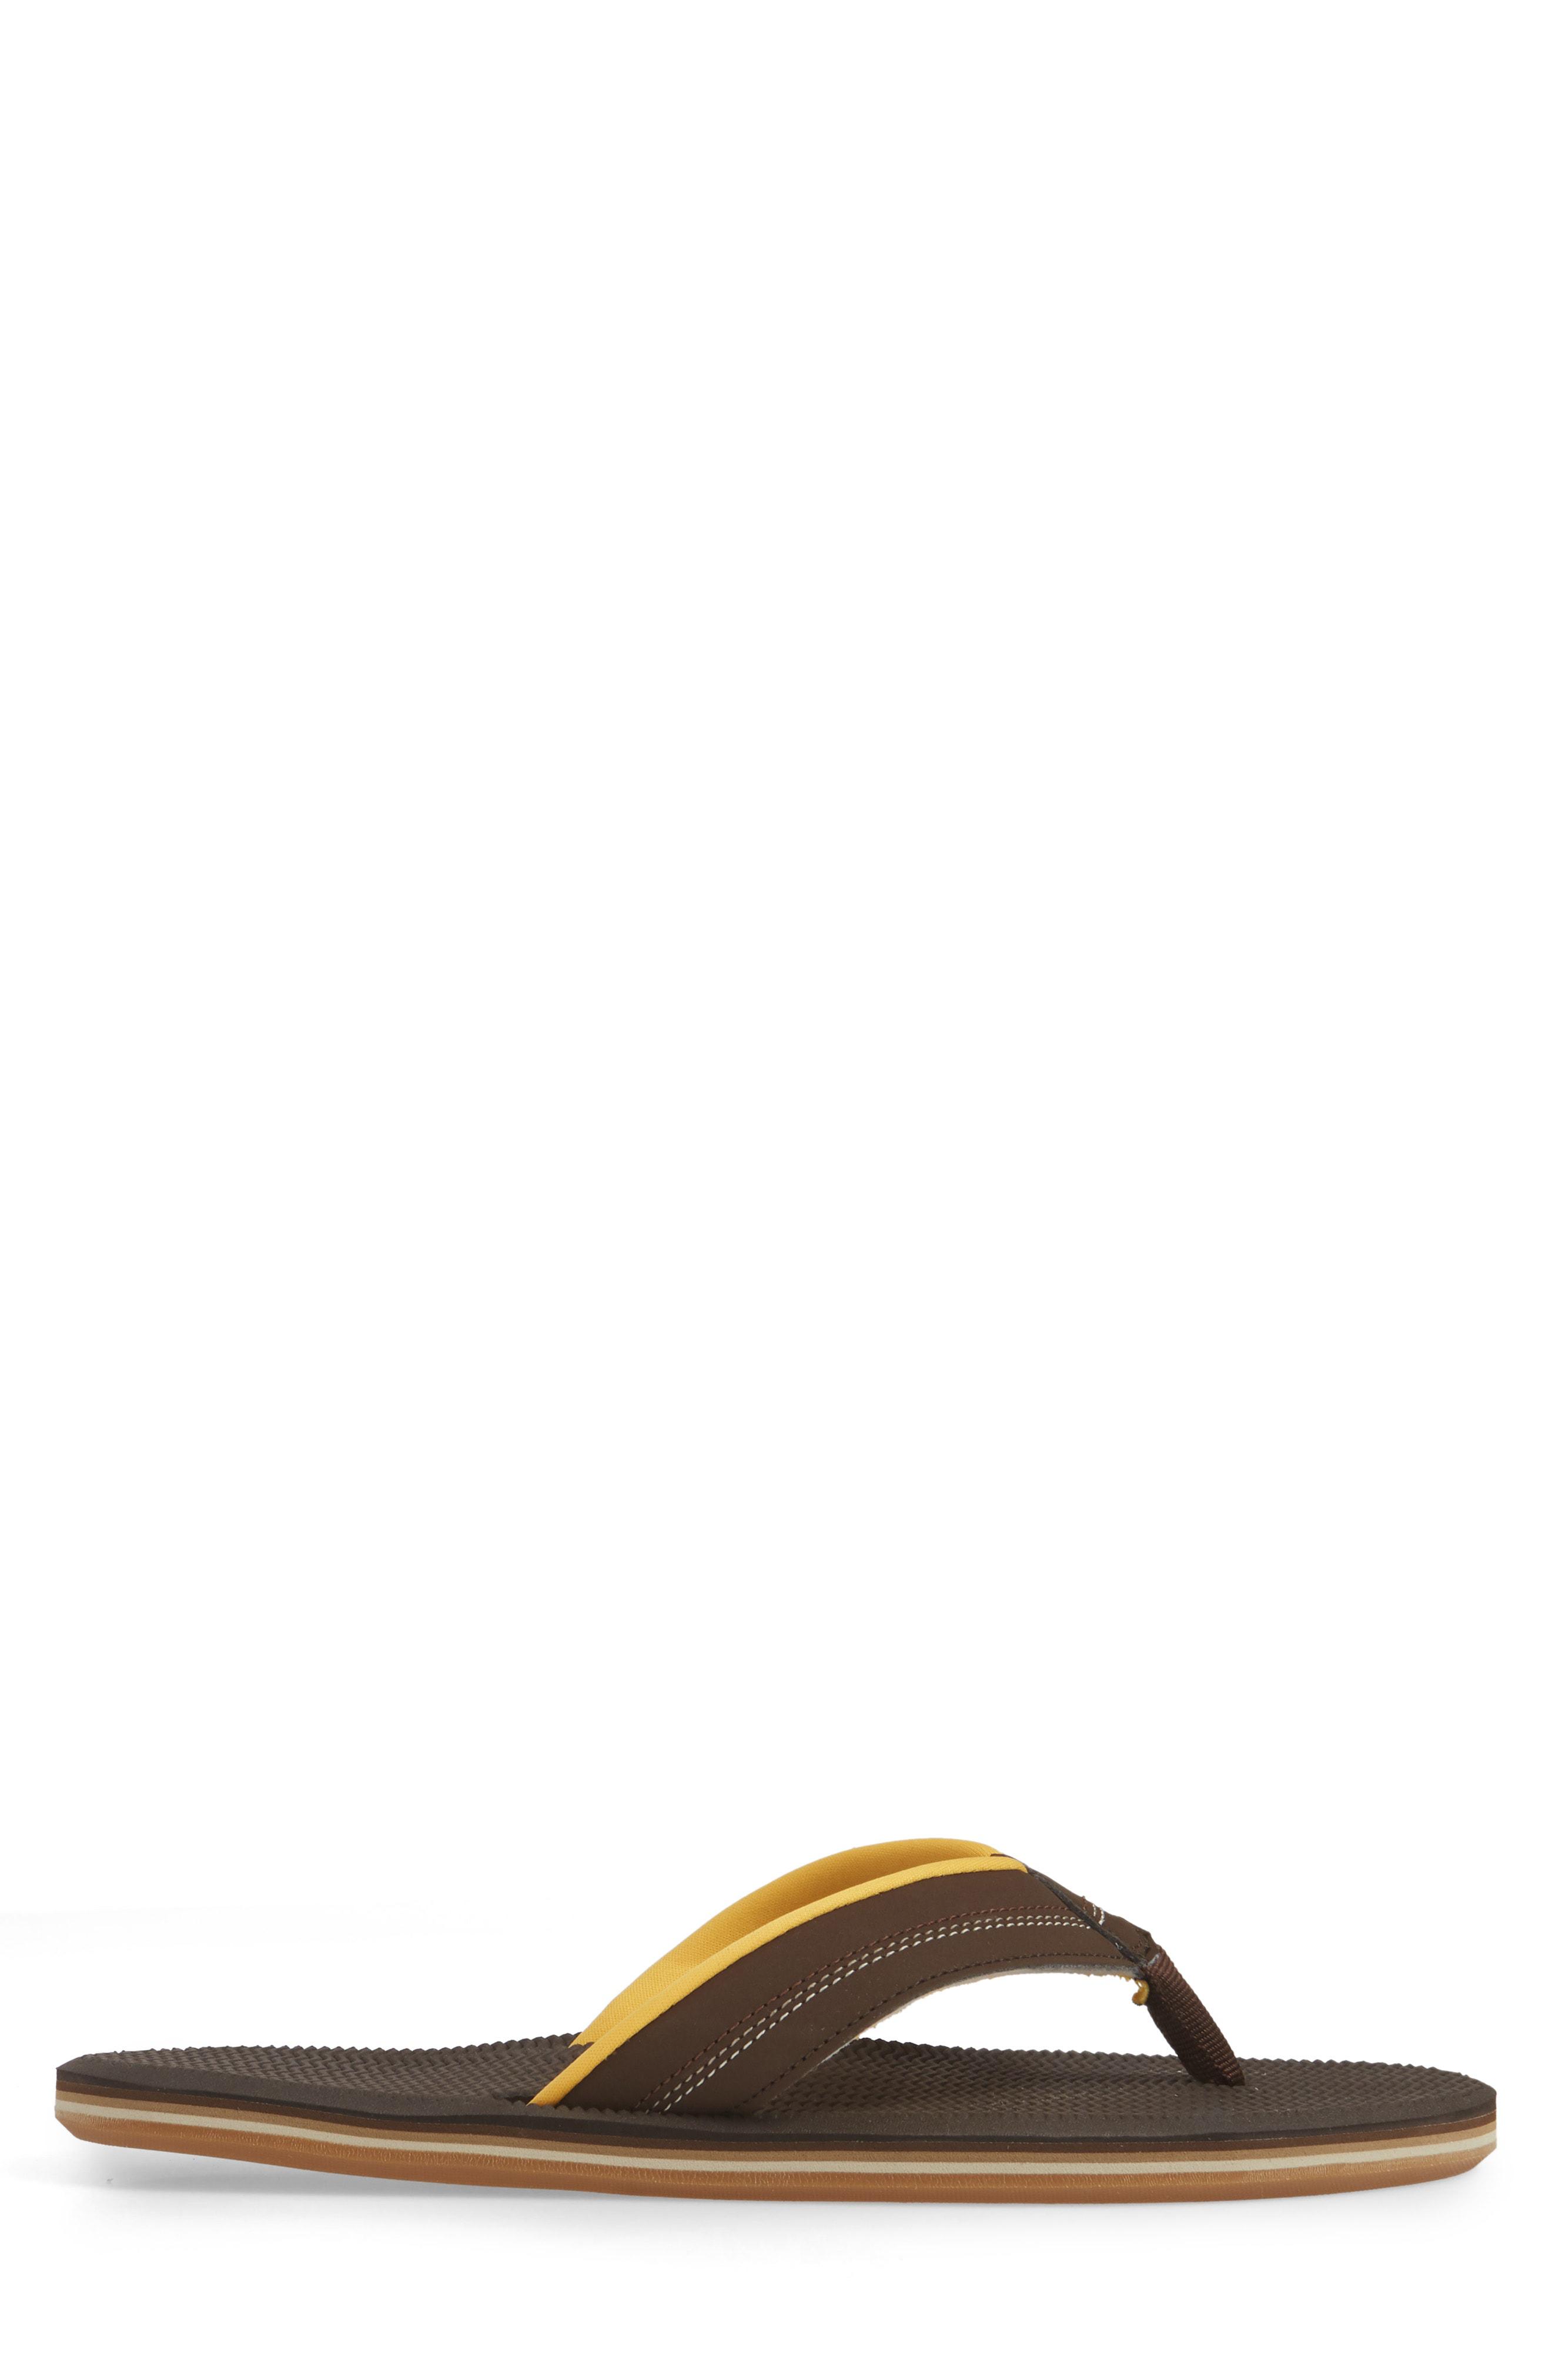 5a4c6028c540 Hari Mari Brazos Flip Flop In Brown  Gold